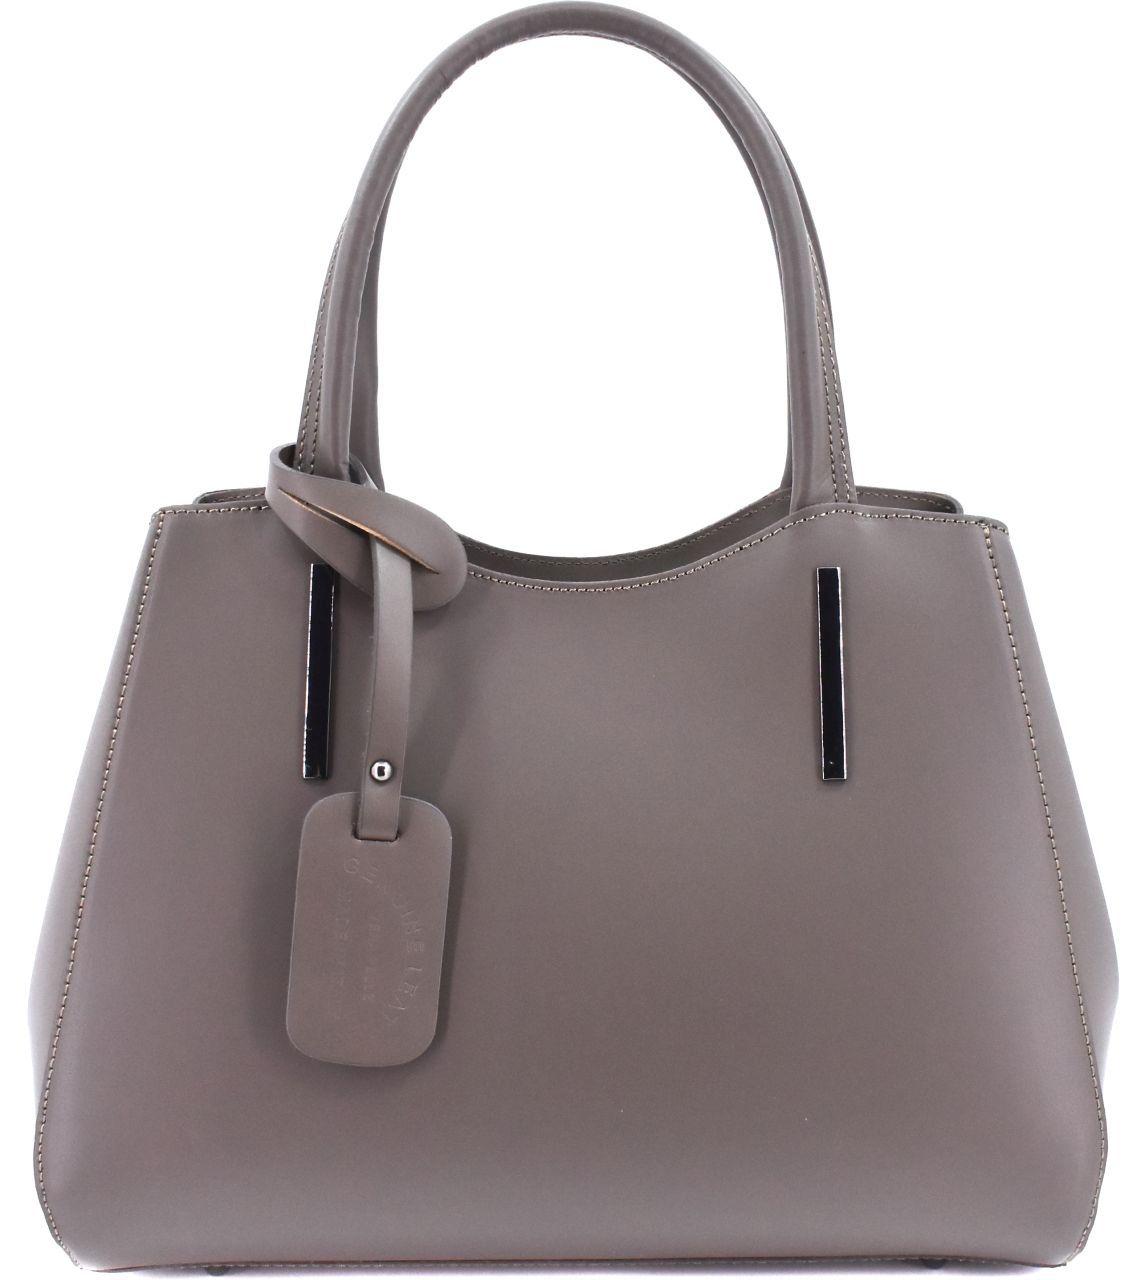 Dámská kožená kabelka Arteddy - taupe